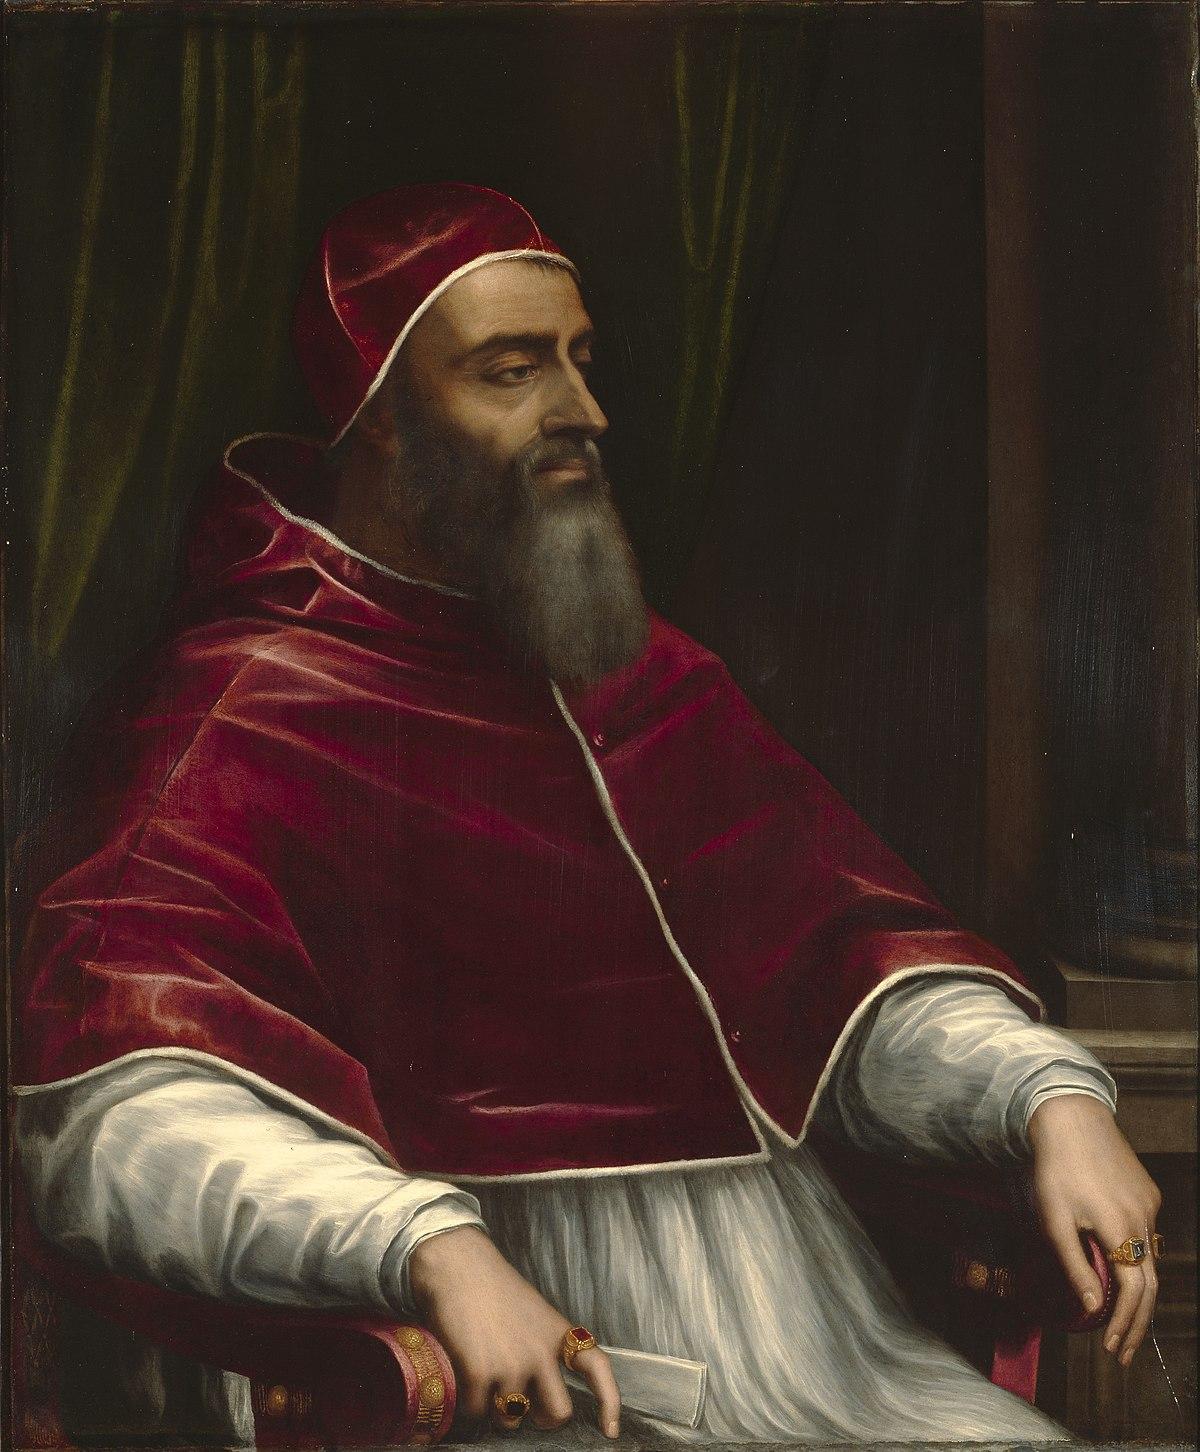 King Francis Ii Illegitimate Child : francis, illegitimate, child, Clement, Wikipedia